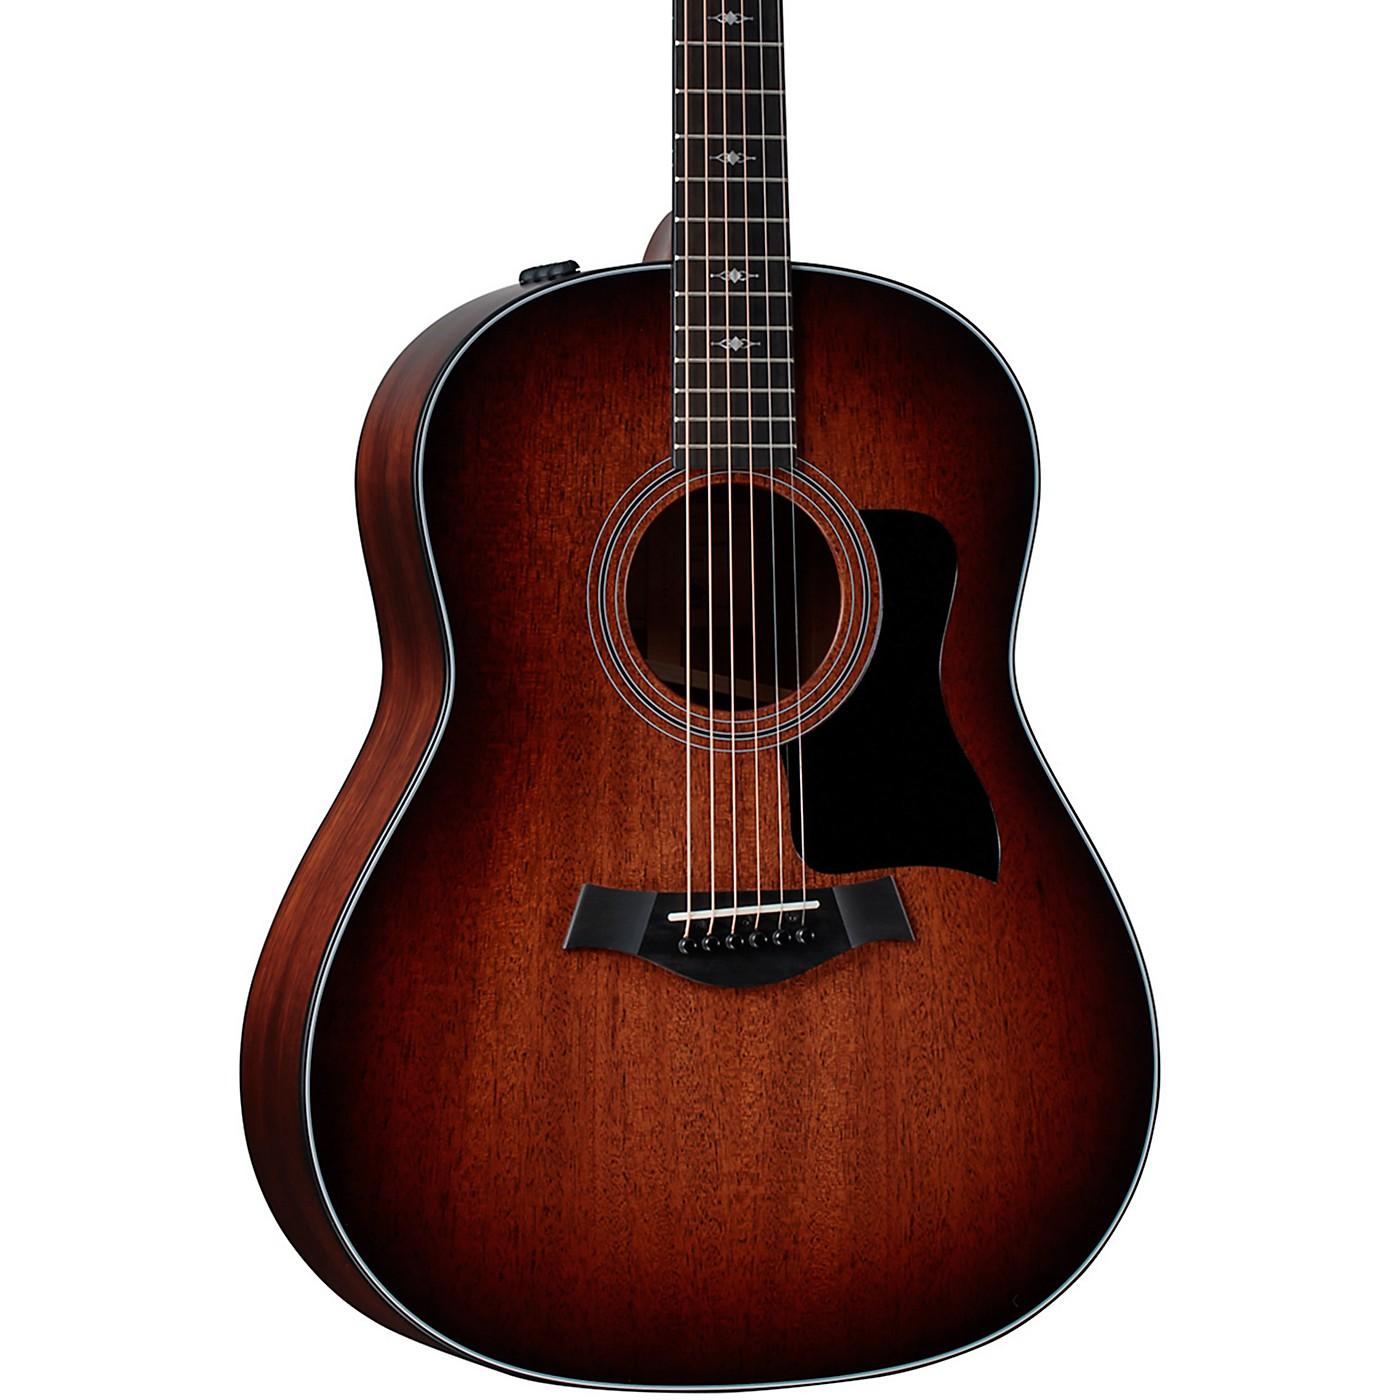 Taylor 327e Grand Pacific Dreadnought Acoustic-Electric Guitar thumbnail